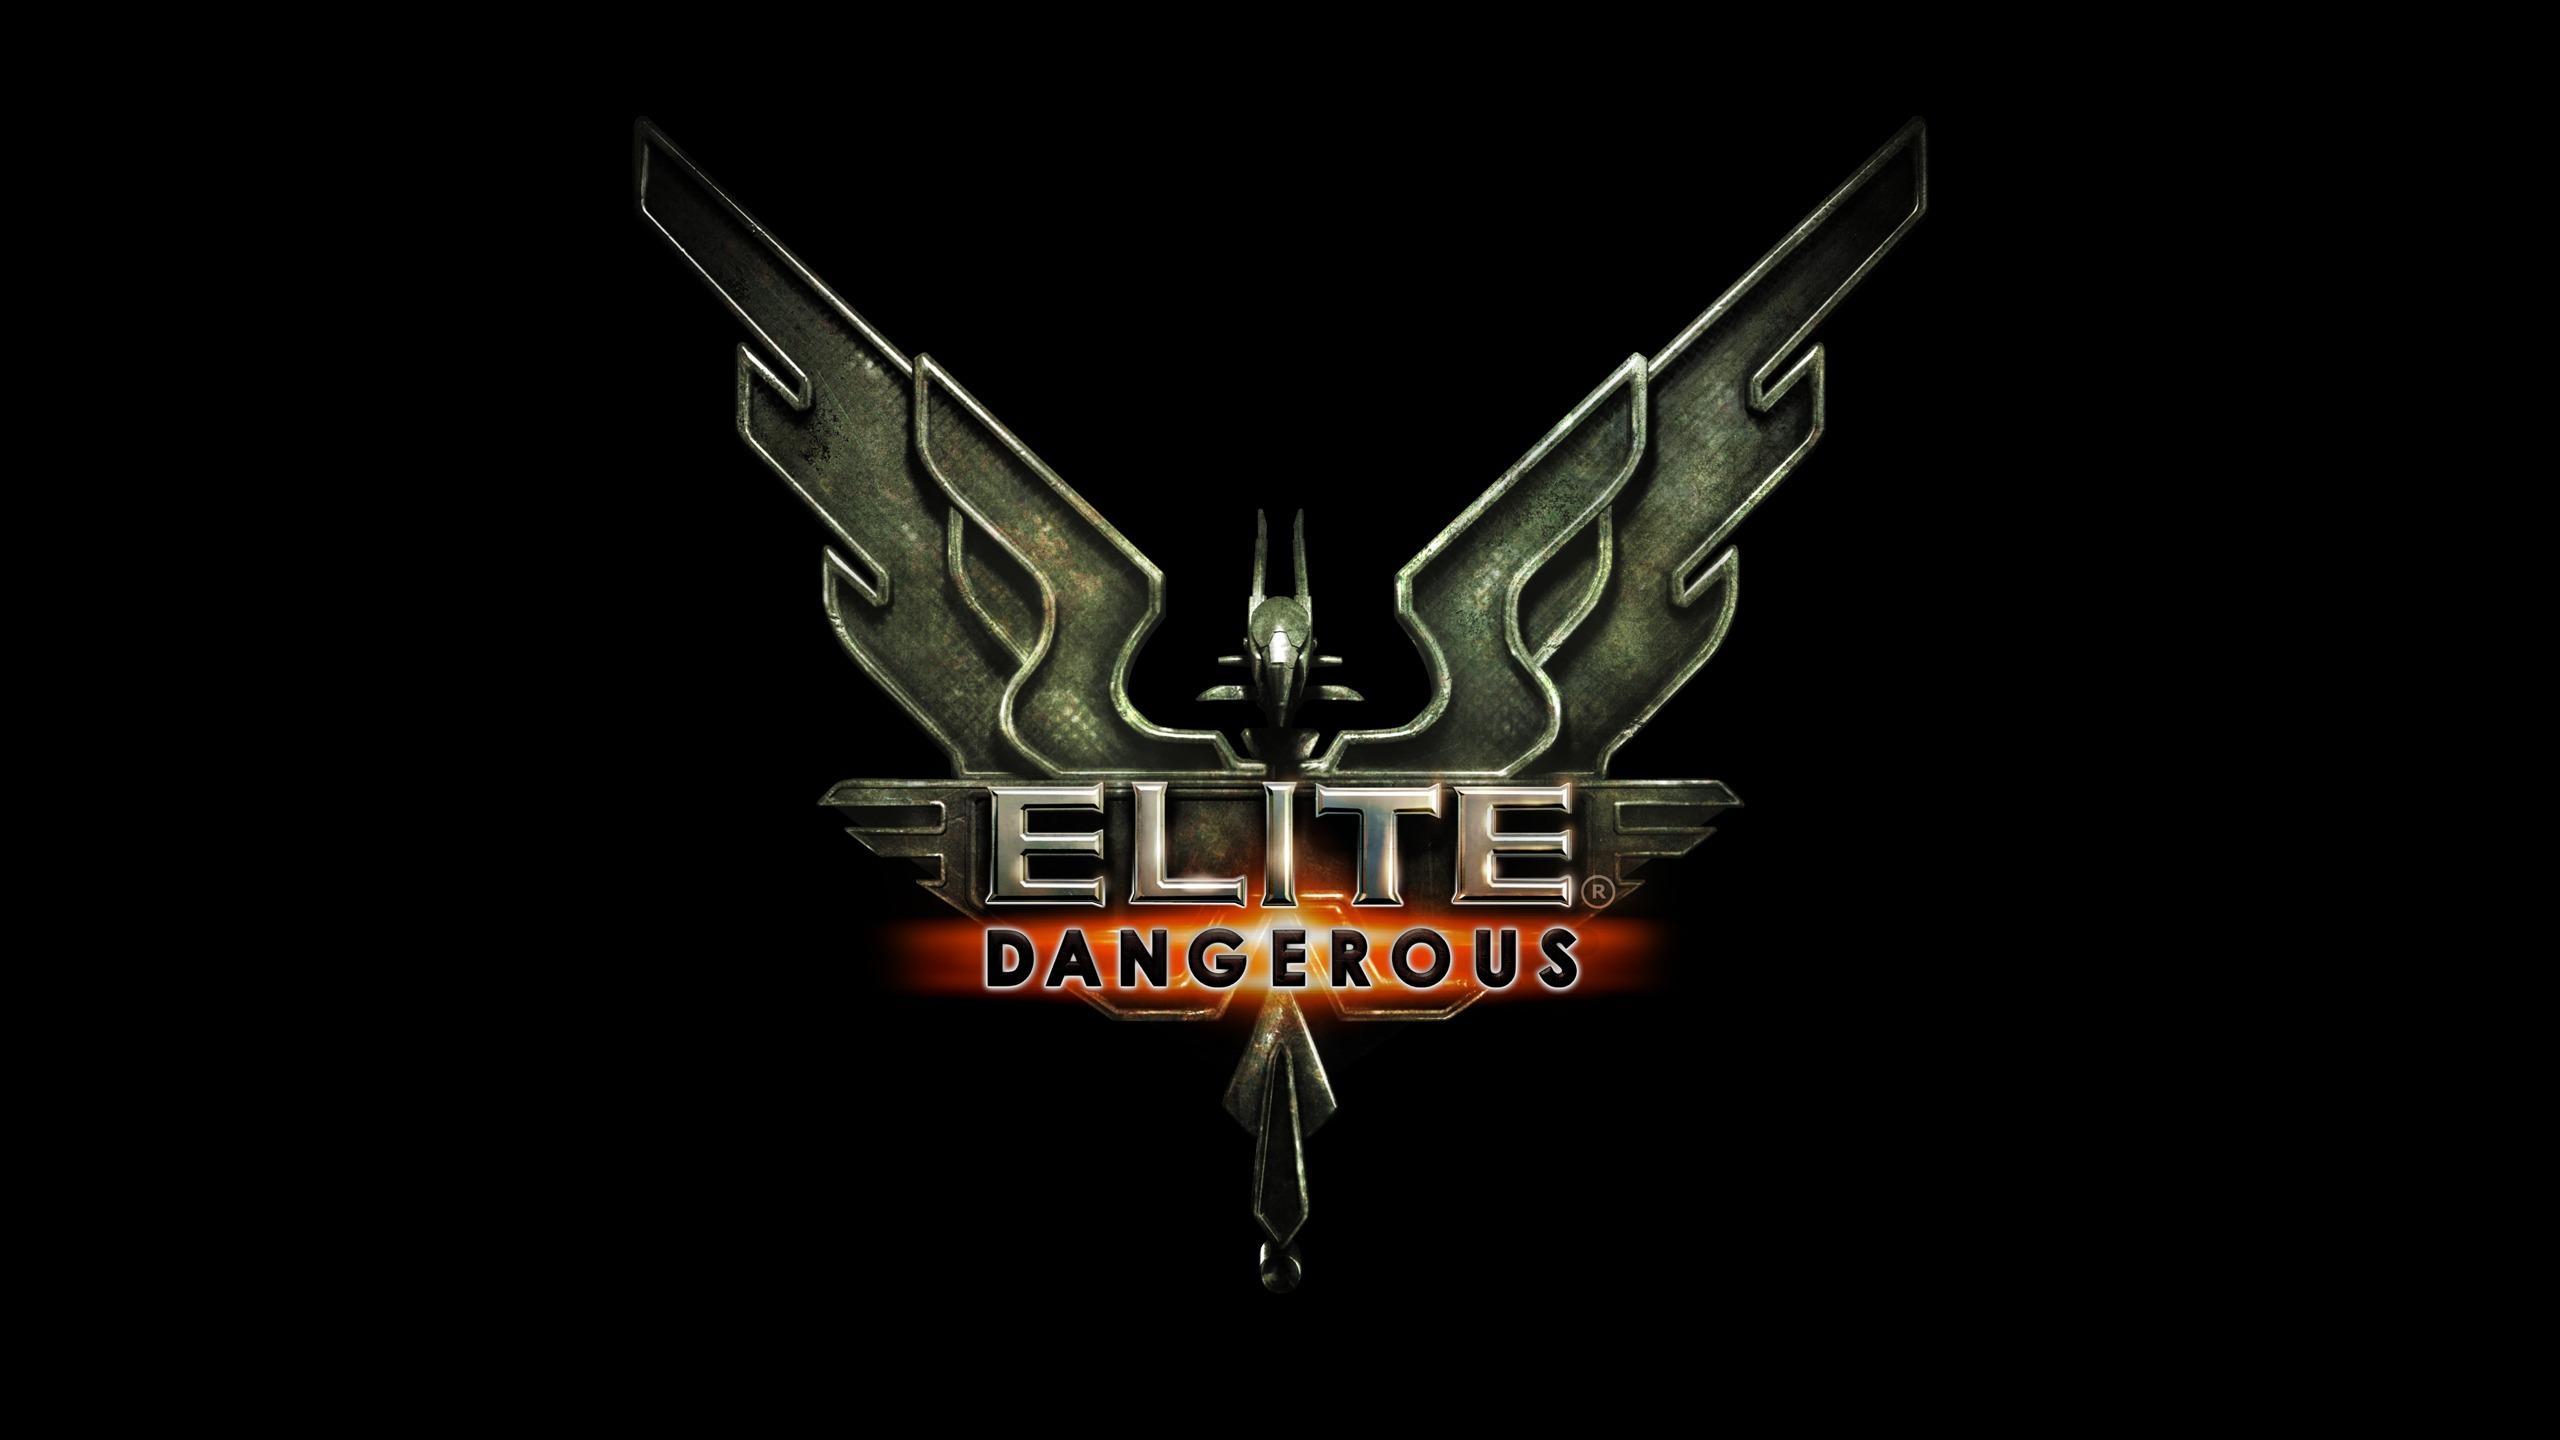 elite dangerous wallpaper hd rings - photo #39